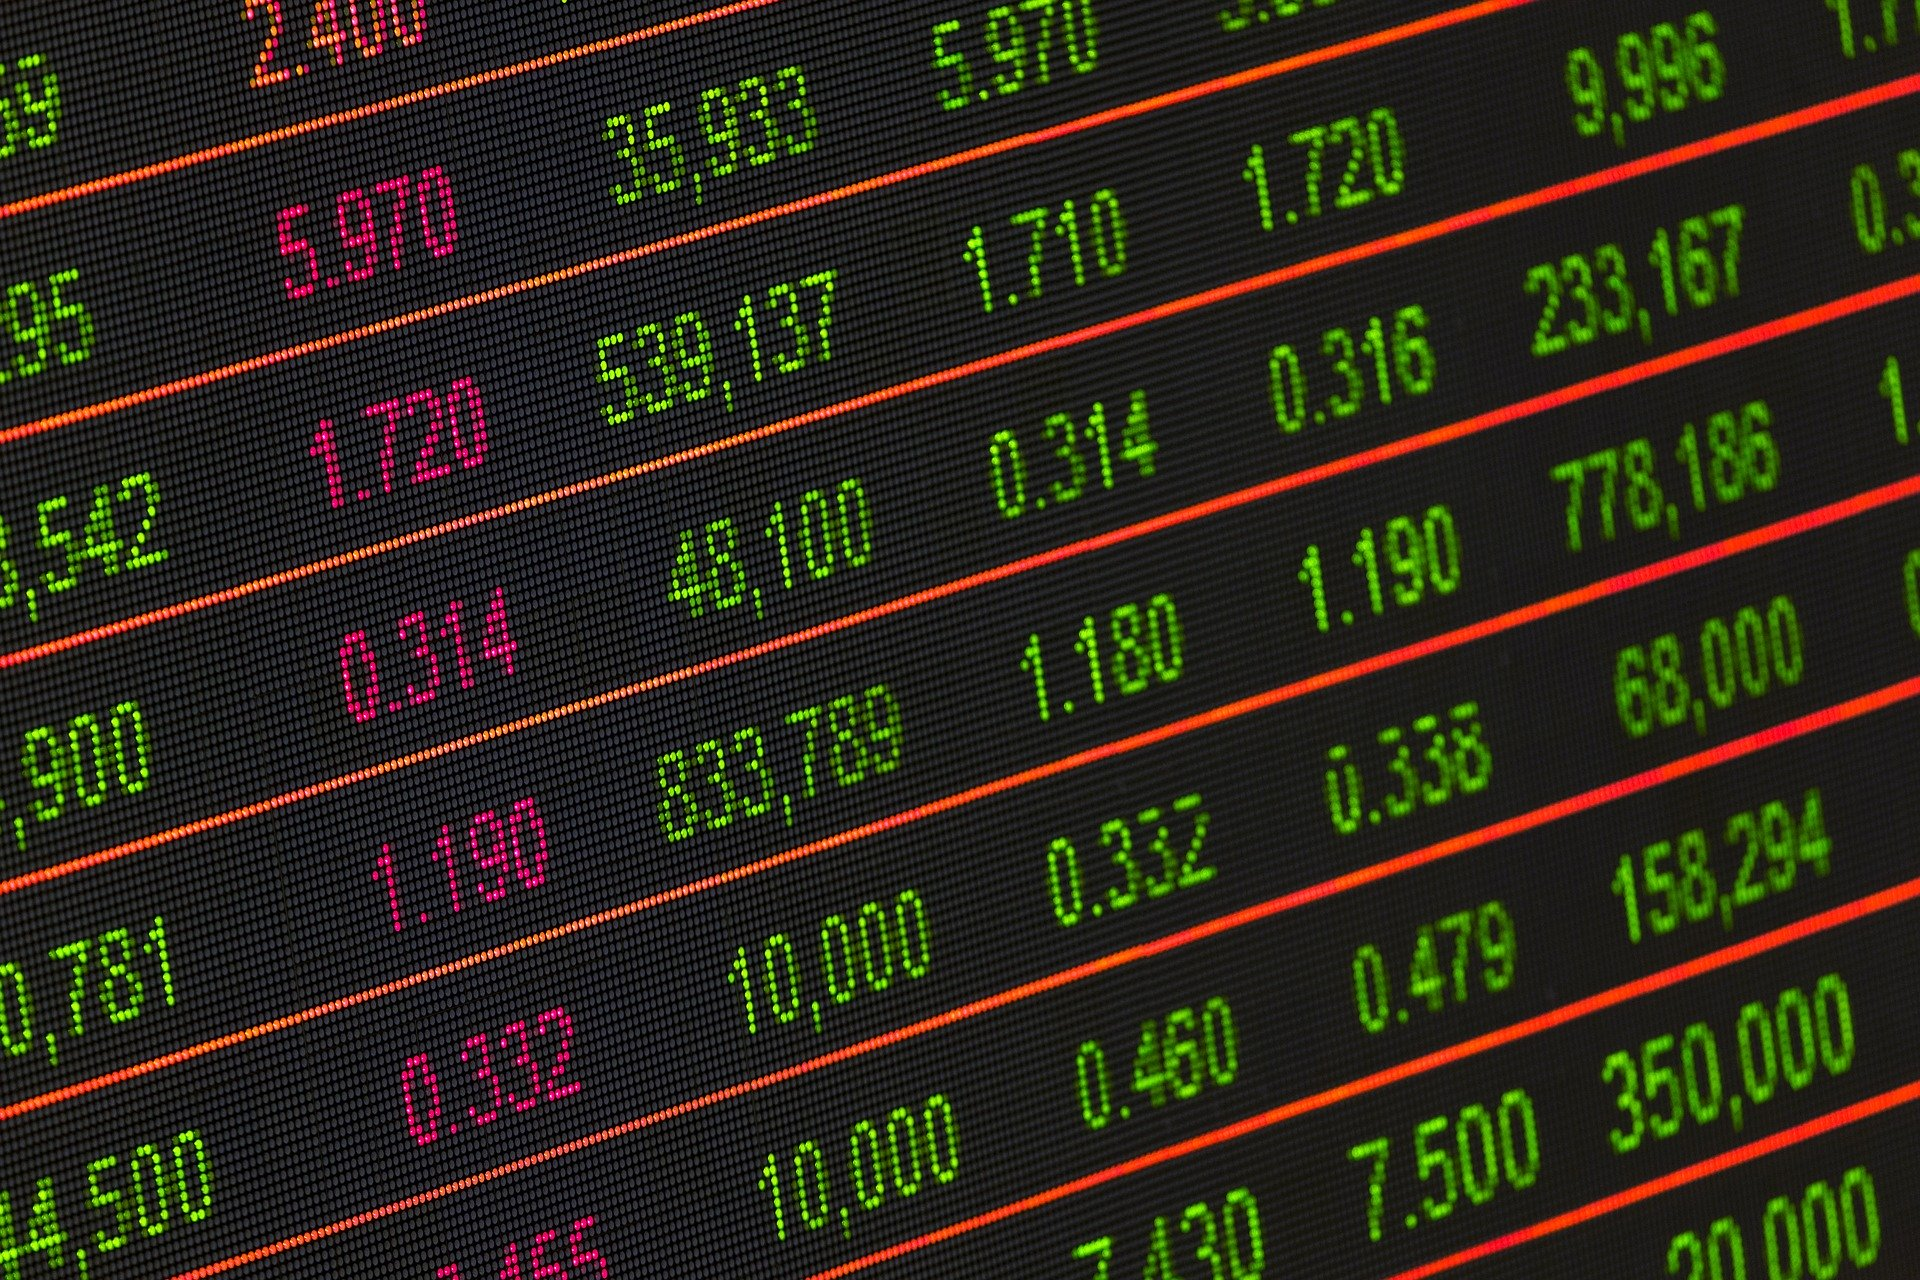 S&P500 companies list